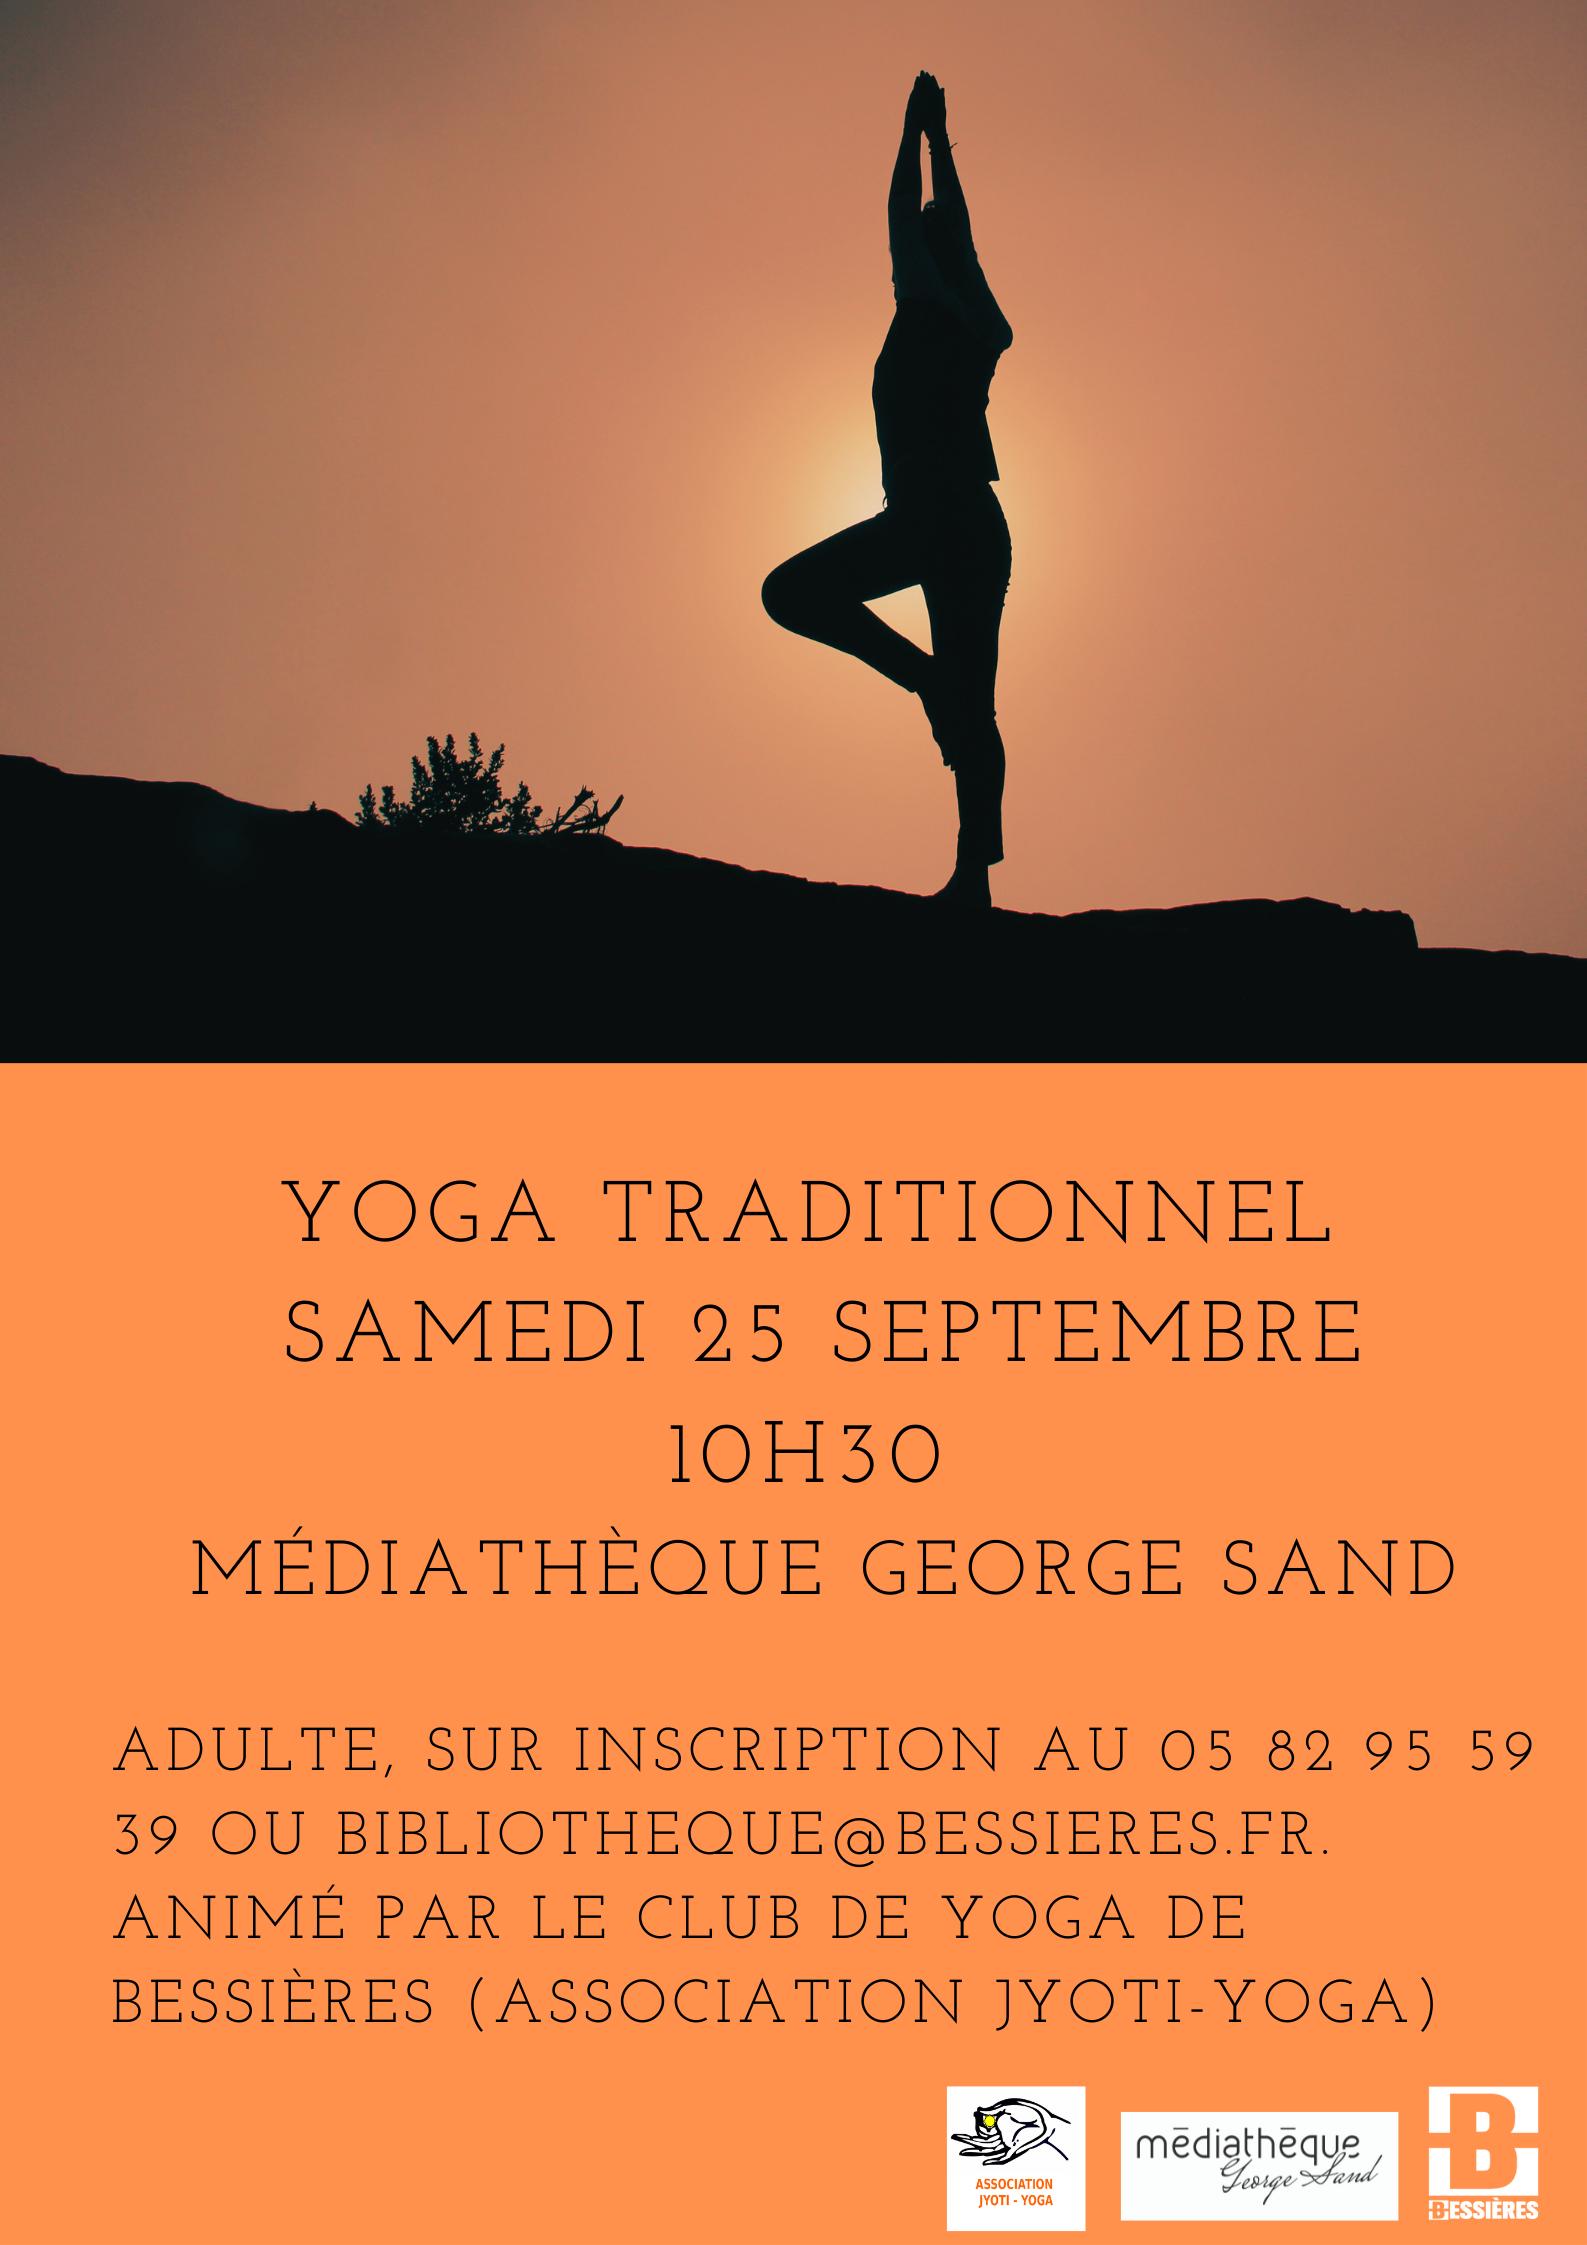 Yoga traditionnel samedi 25 septembre à 10h30